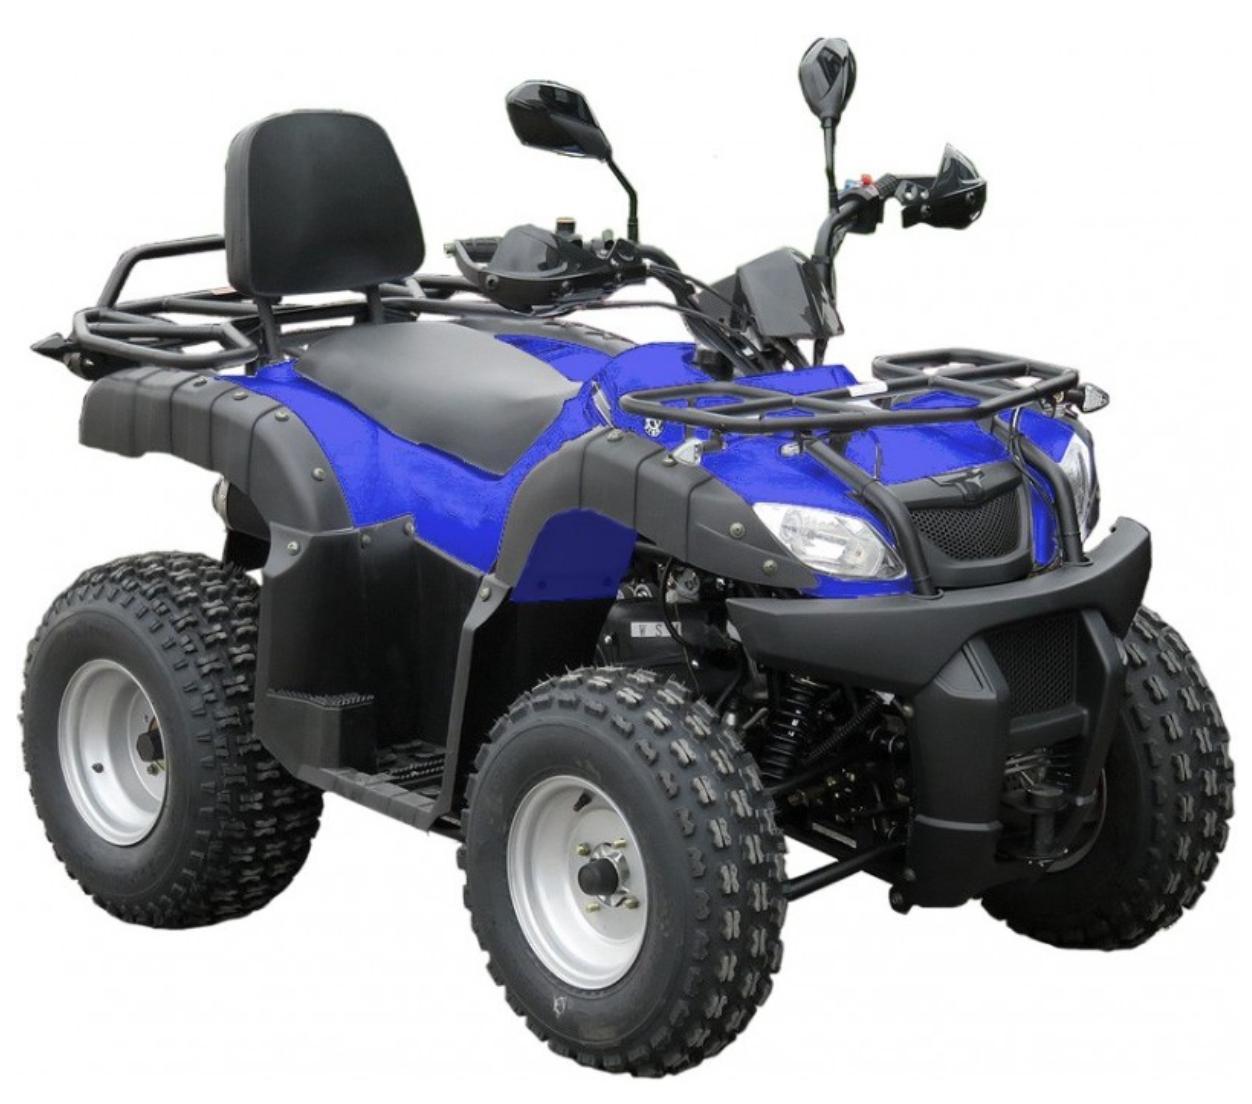 quad shineray utilitaire 200cc automatique bleu. Black Bedroom Furniture Sets. Home Design Ideas